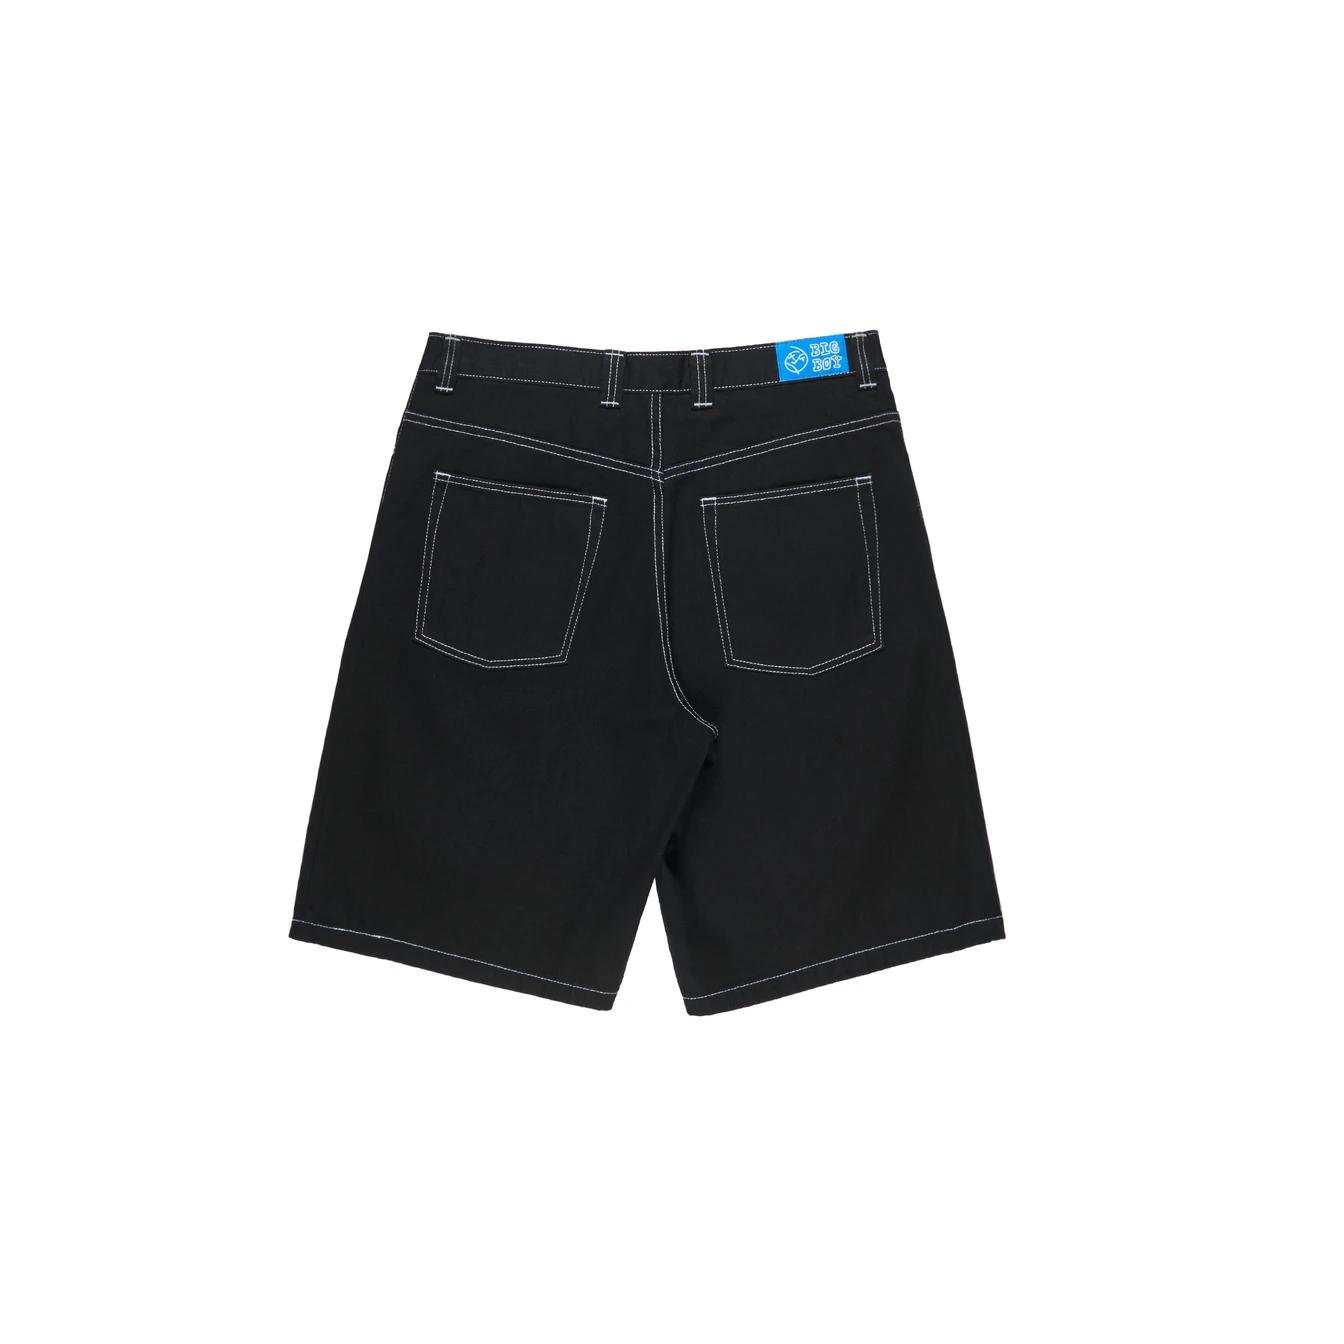 Polar Skate Co. Big Boy Shorts Black